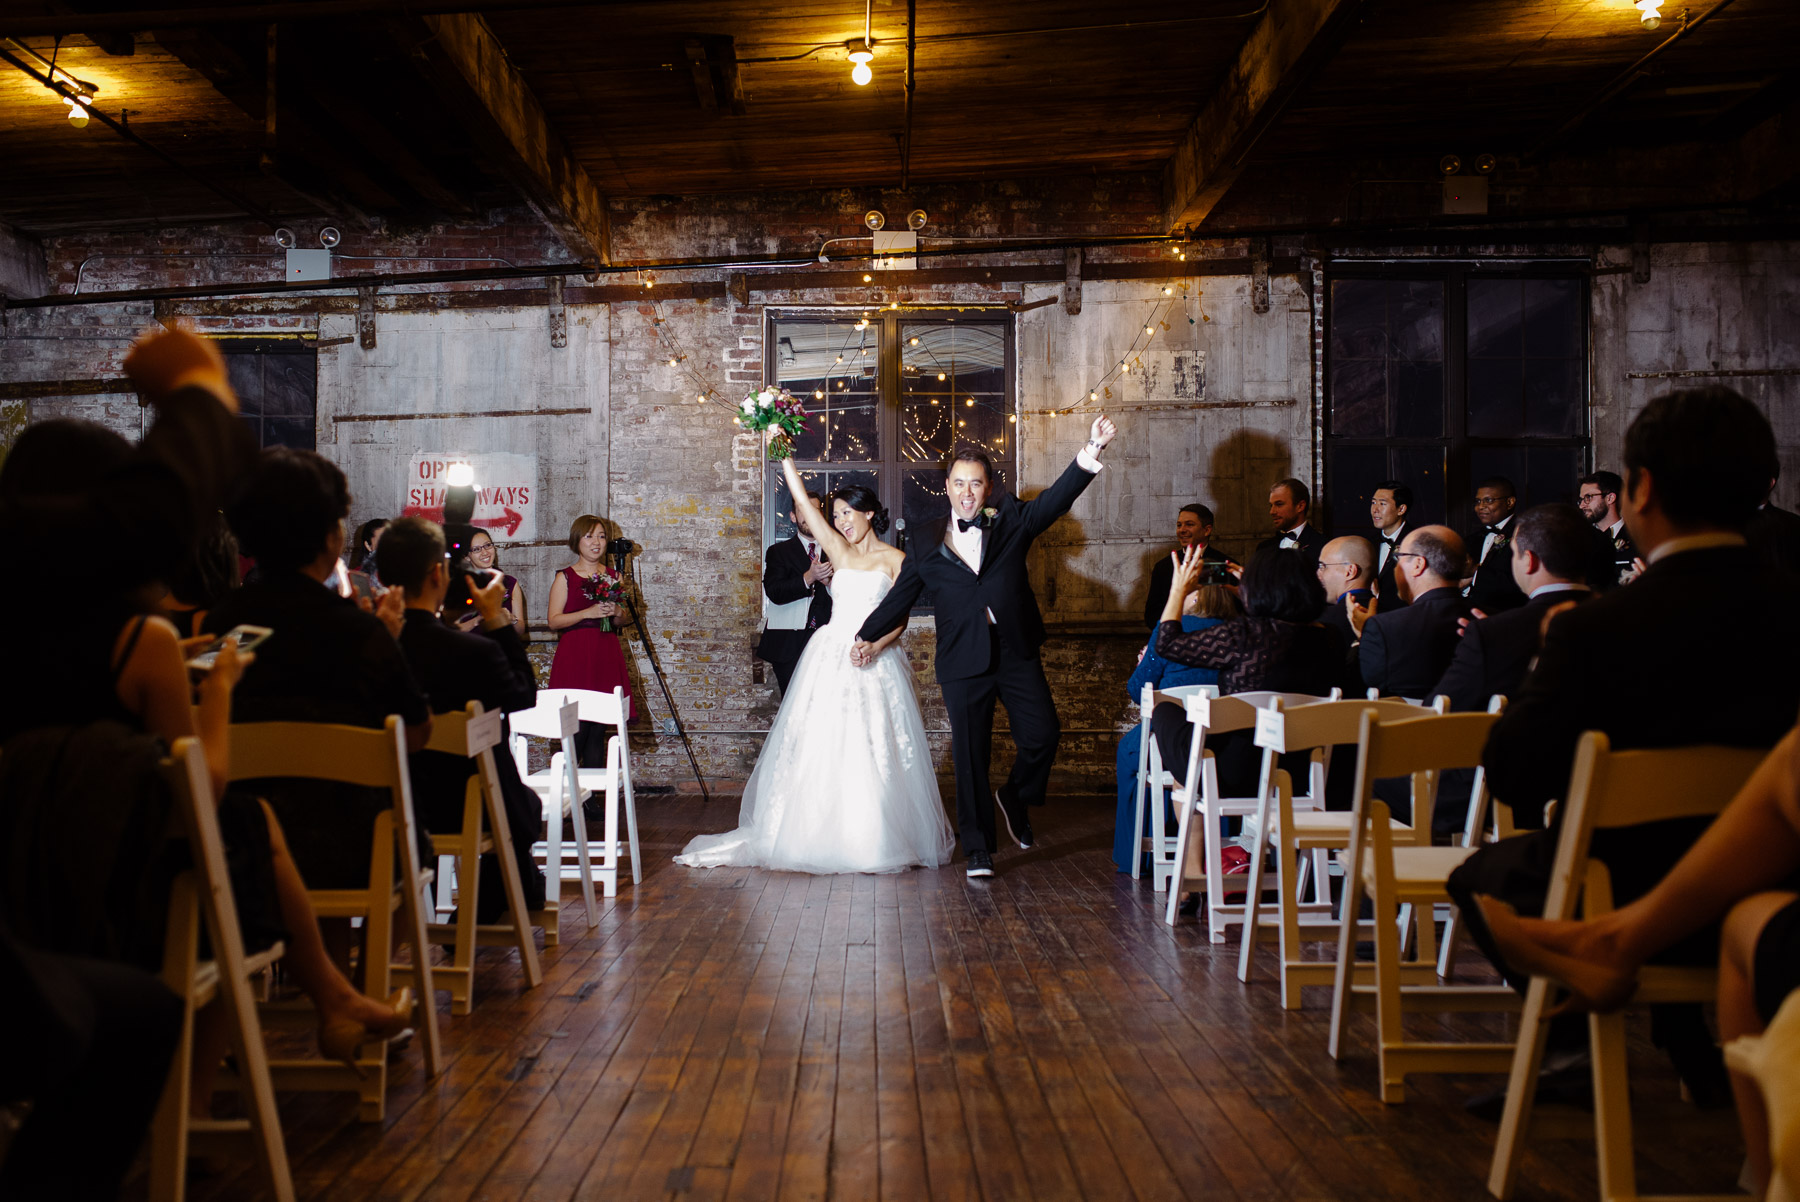 greenpoint-loft-brooklyn-wedding-photos-28.jpg